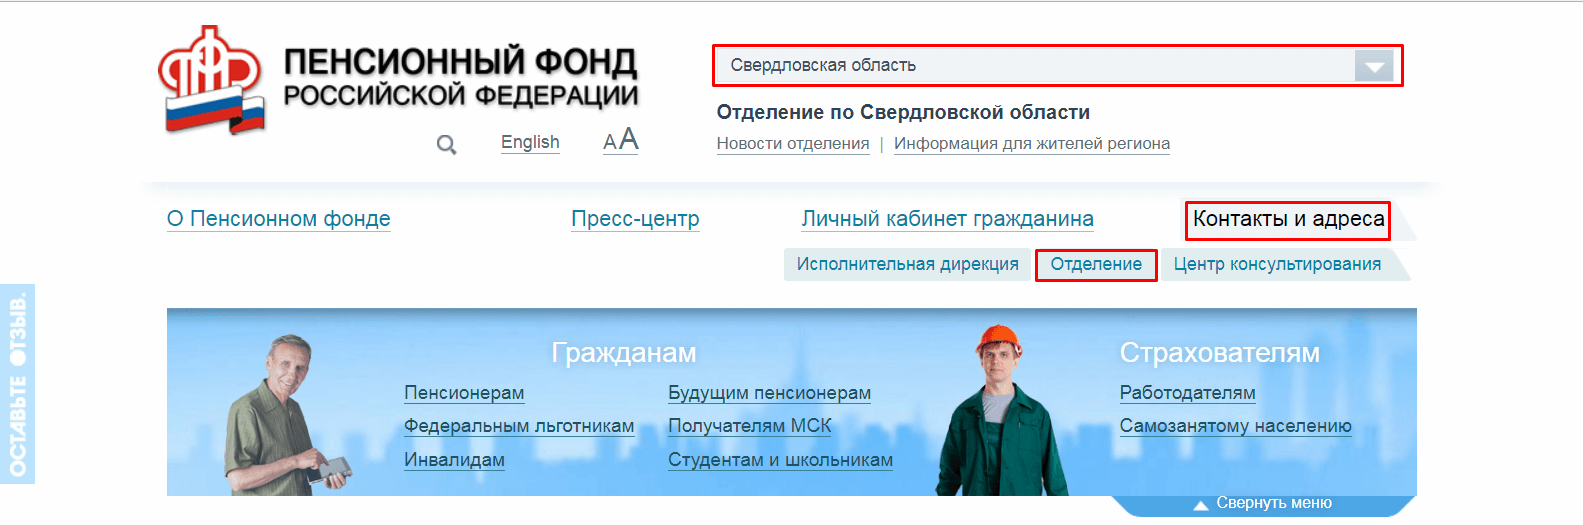 Пенсионный фонд Екатеринбург